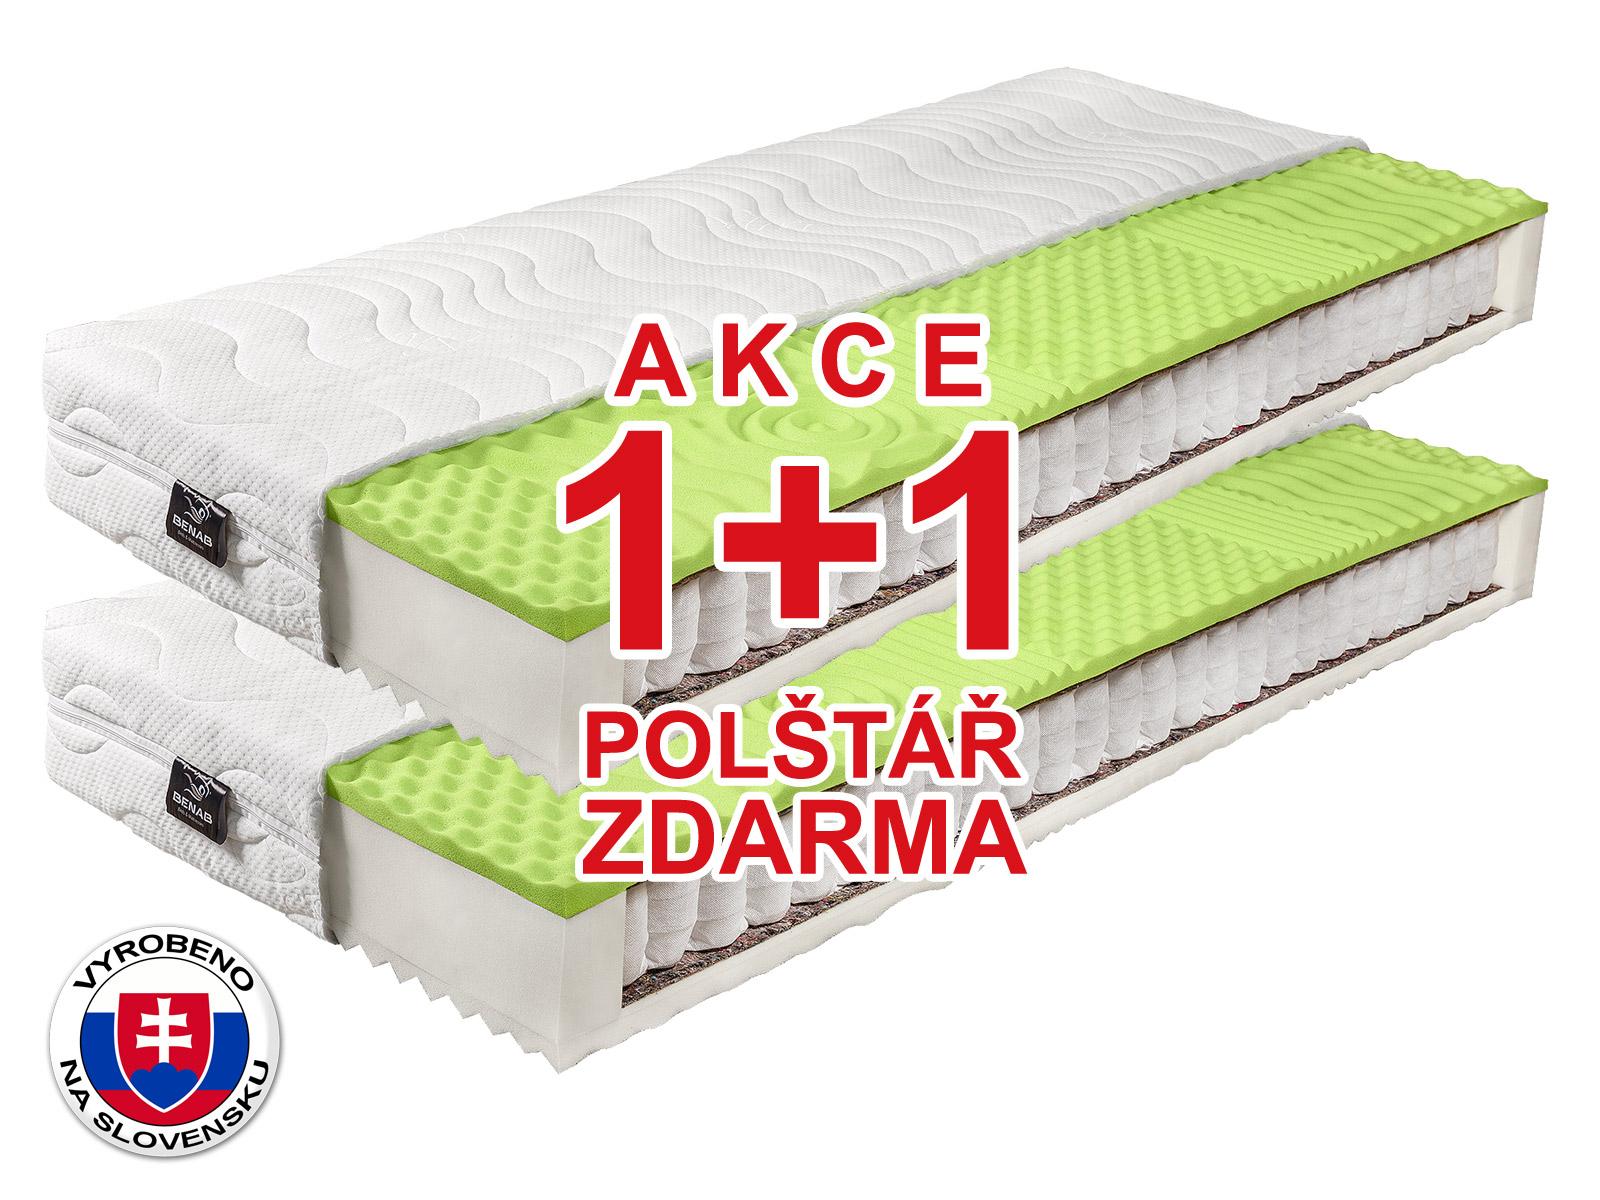 Taštičková matrace - Benab - Ergomax - 200x80 cm (T3/T4) *AKCE 1+1